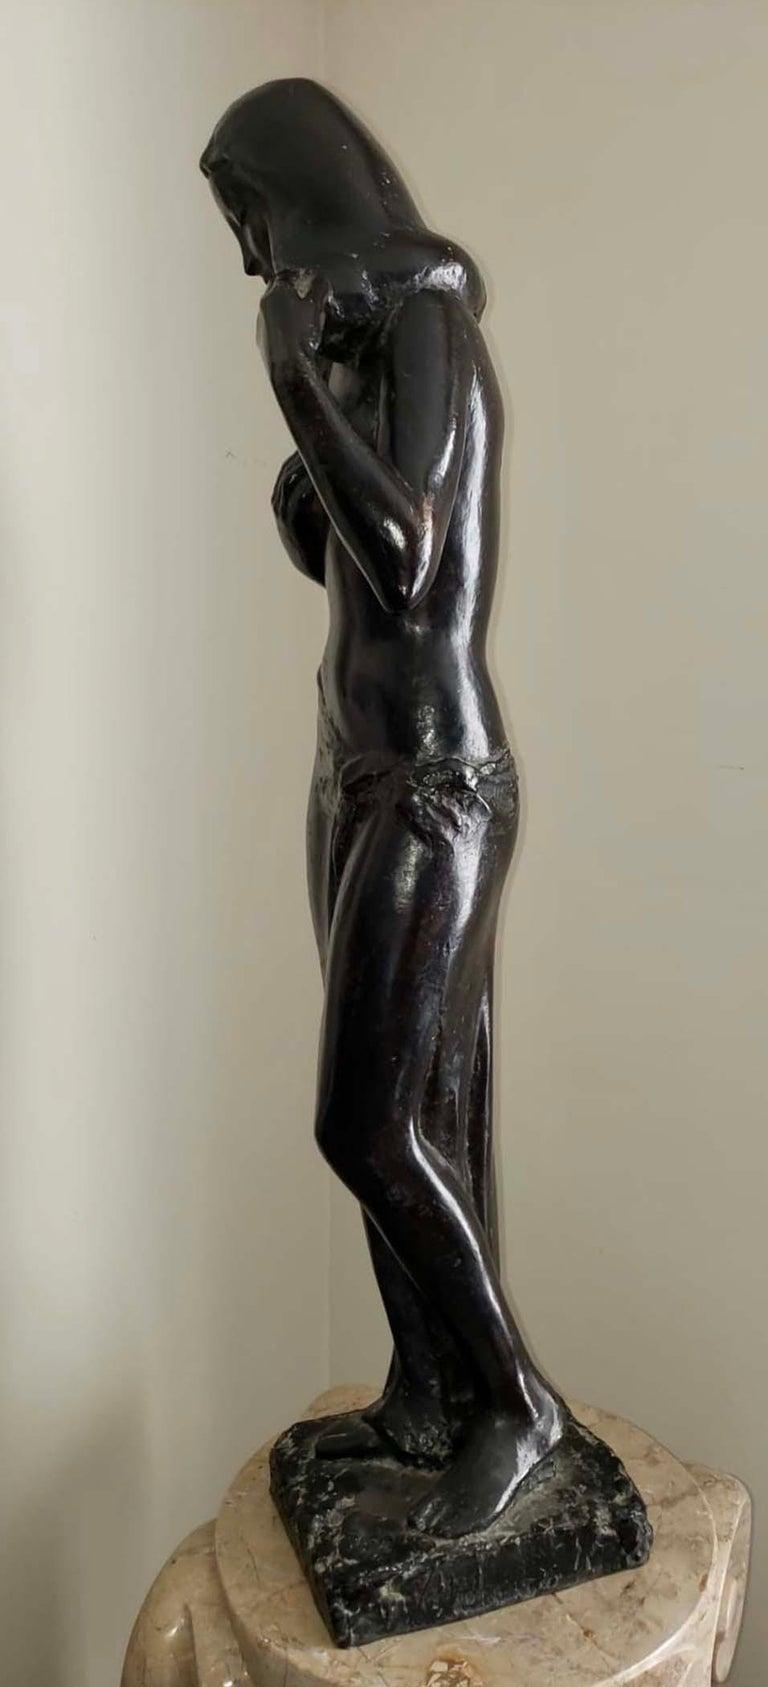 Venus - Gold Figurative Sculpture by Guy Charles Revol